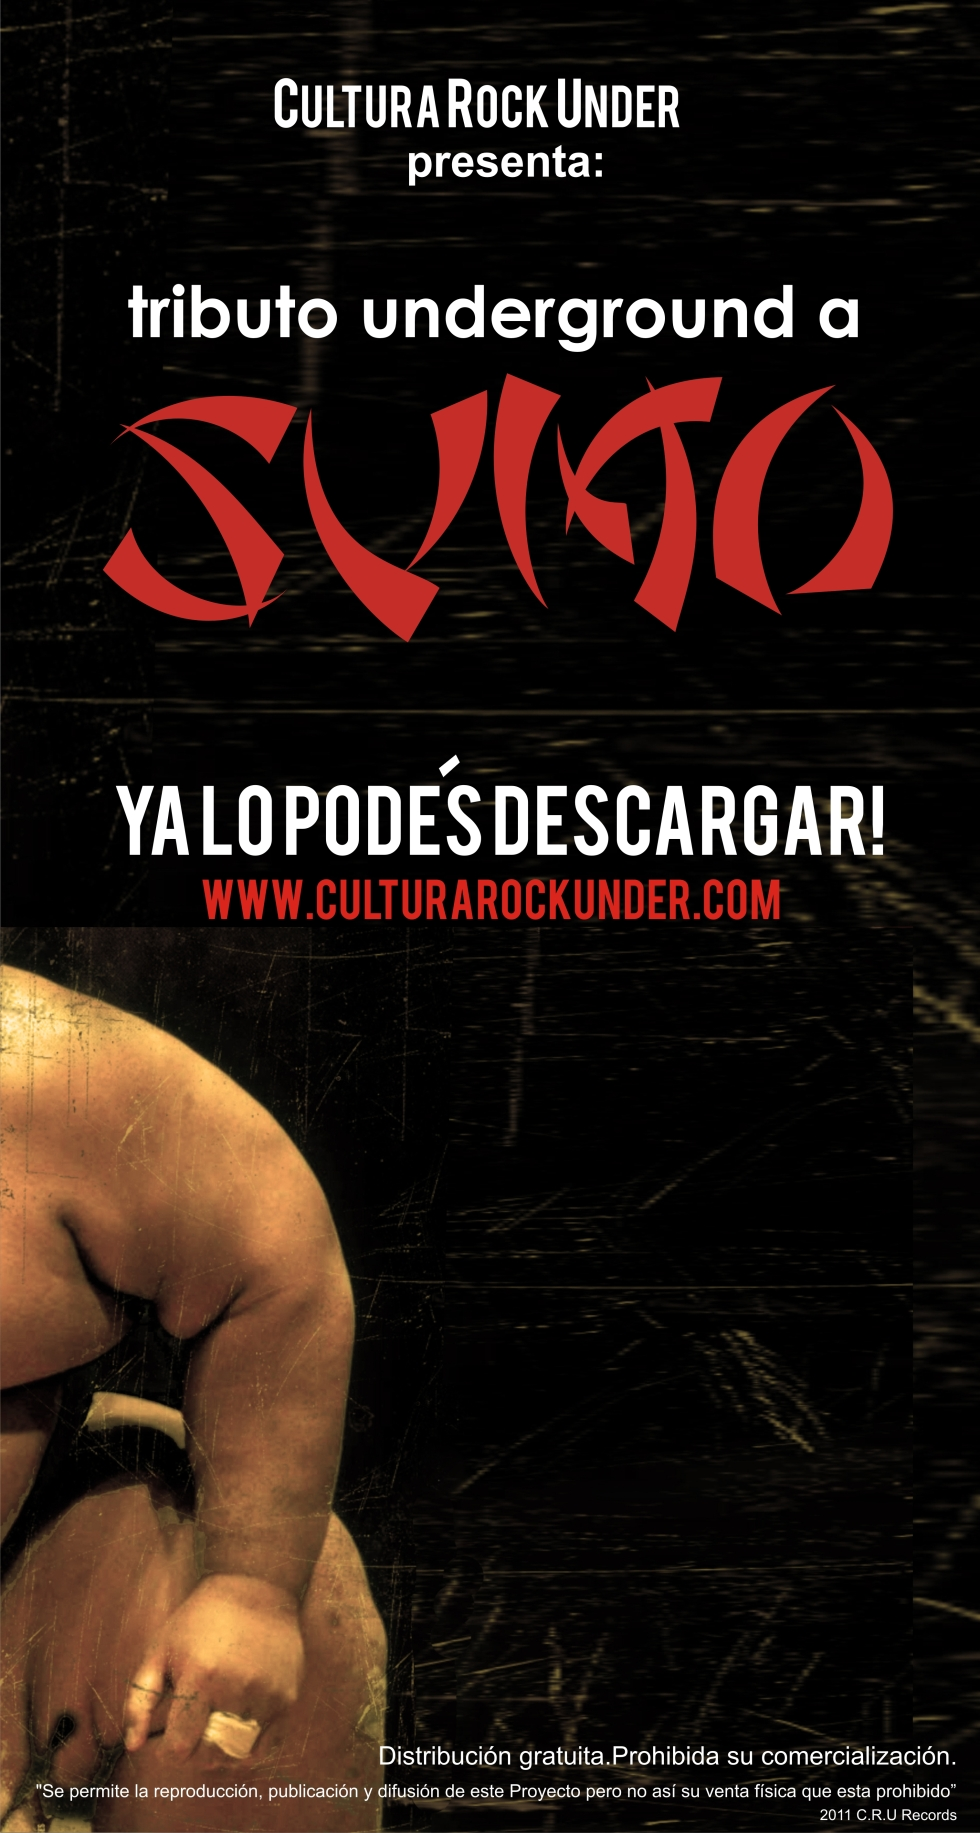 CRU Records - Tributo Underground a Sumo